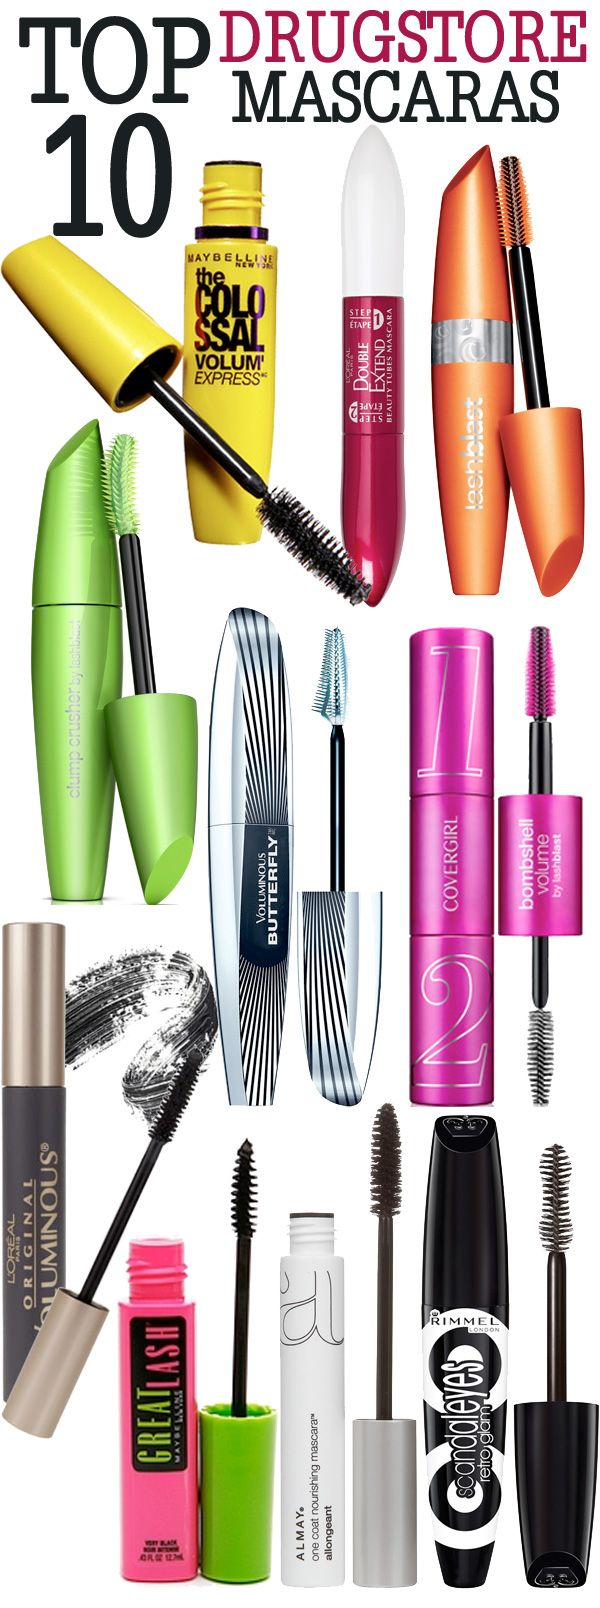 Top 10 Drugstore Mascaras.   Beauty tips, Good mascara and Eyelashes